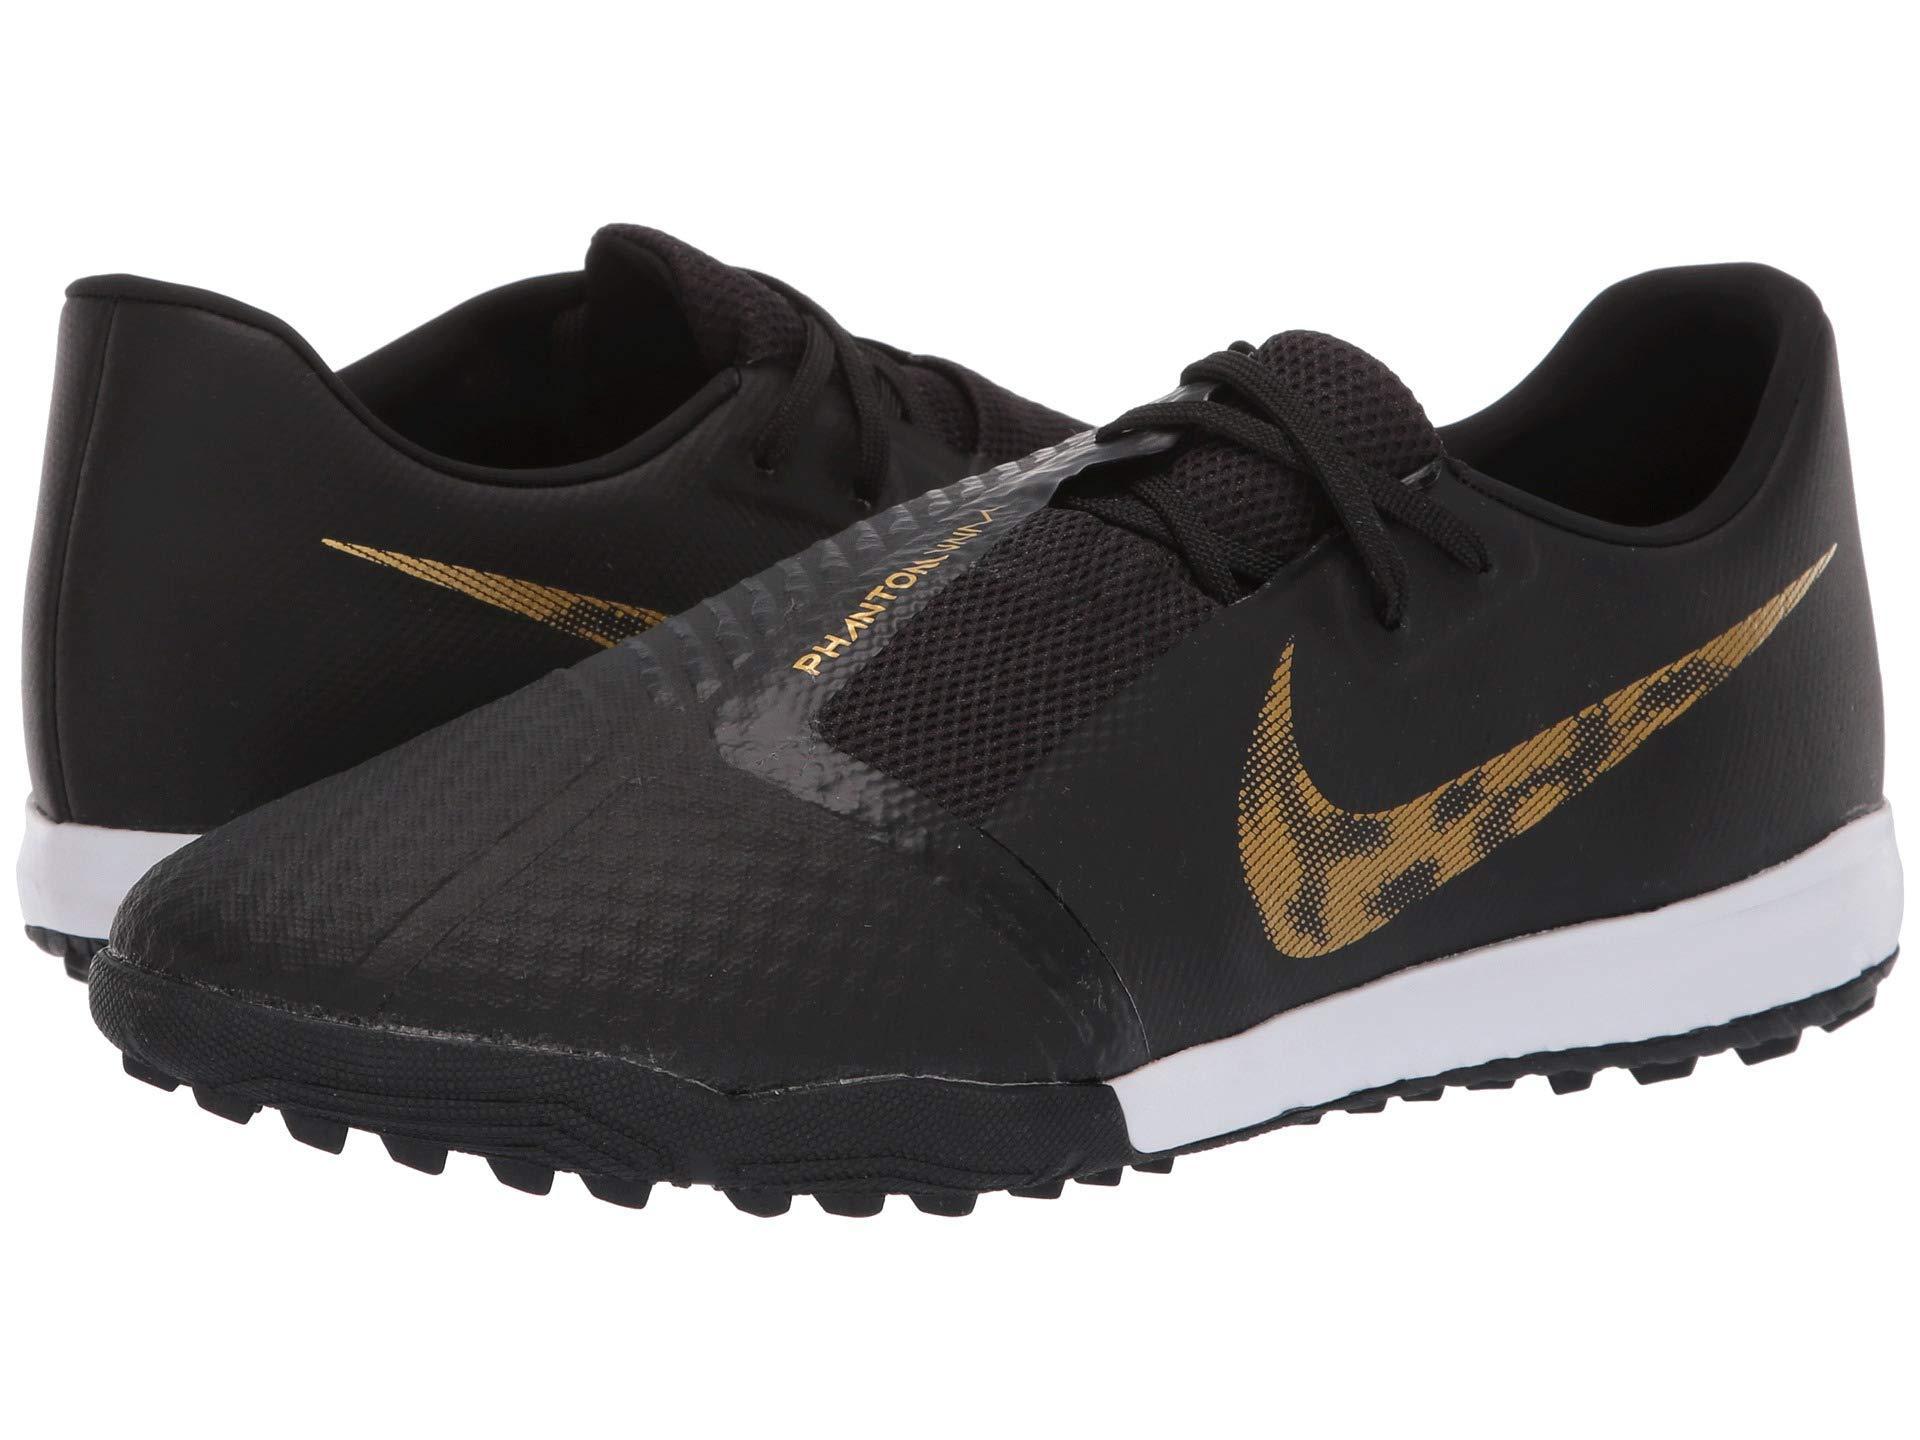 c45d6f5be Nike. Phantom Venom Academy Tf (black metallic Vivid Gold) Men s Soccer  Shoes